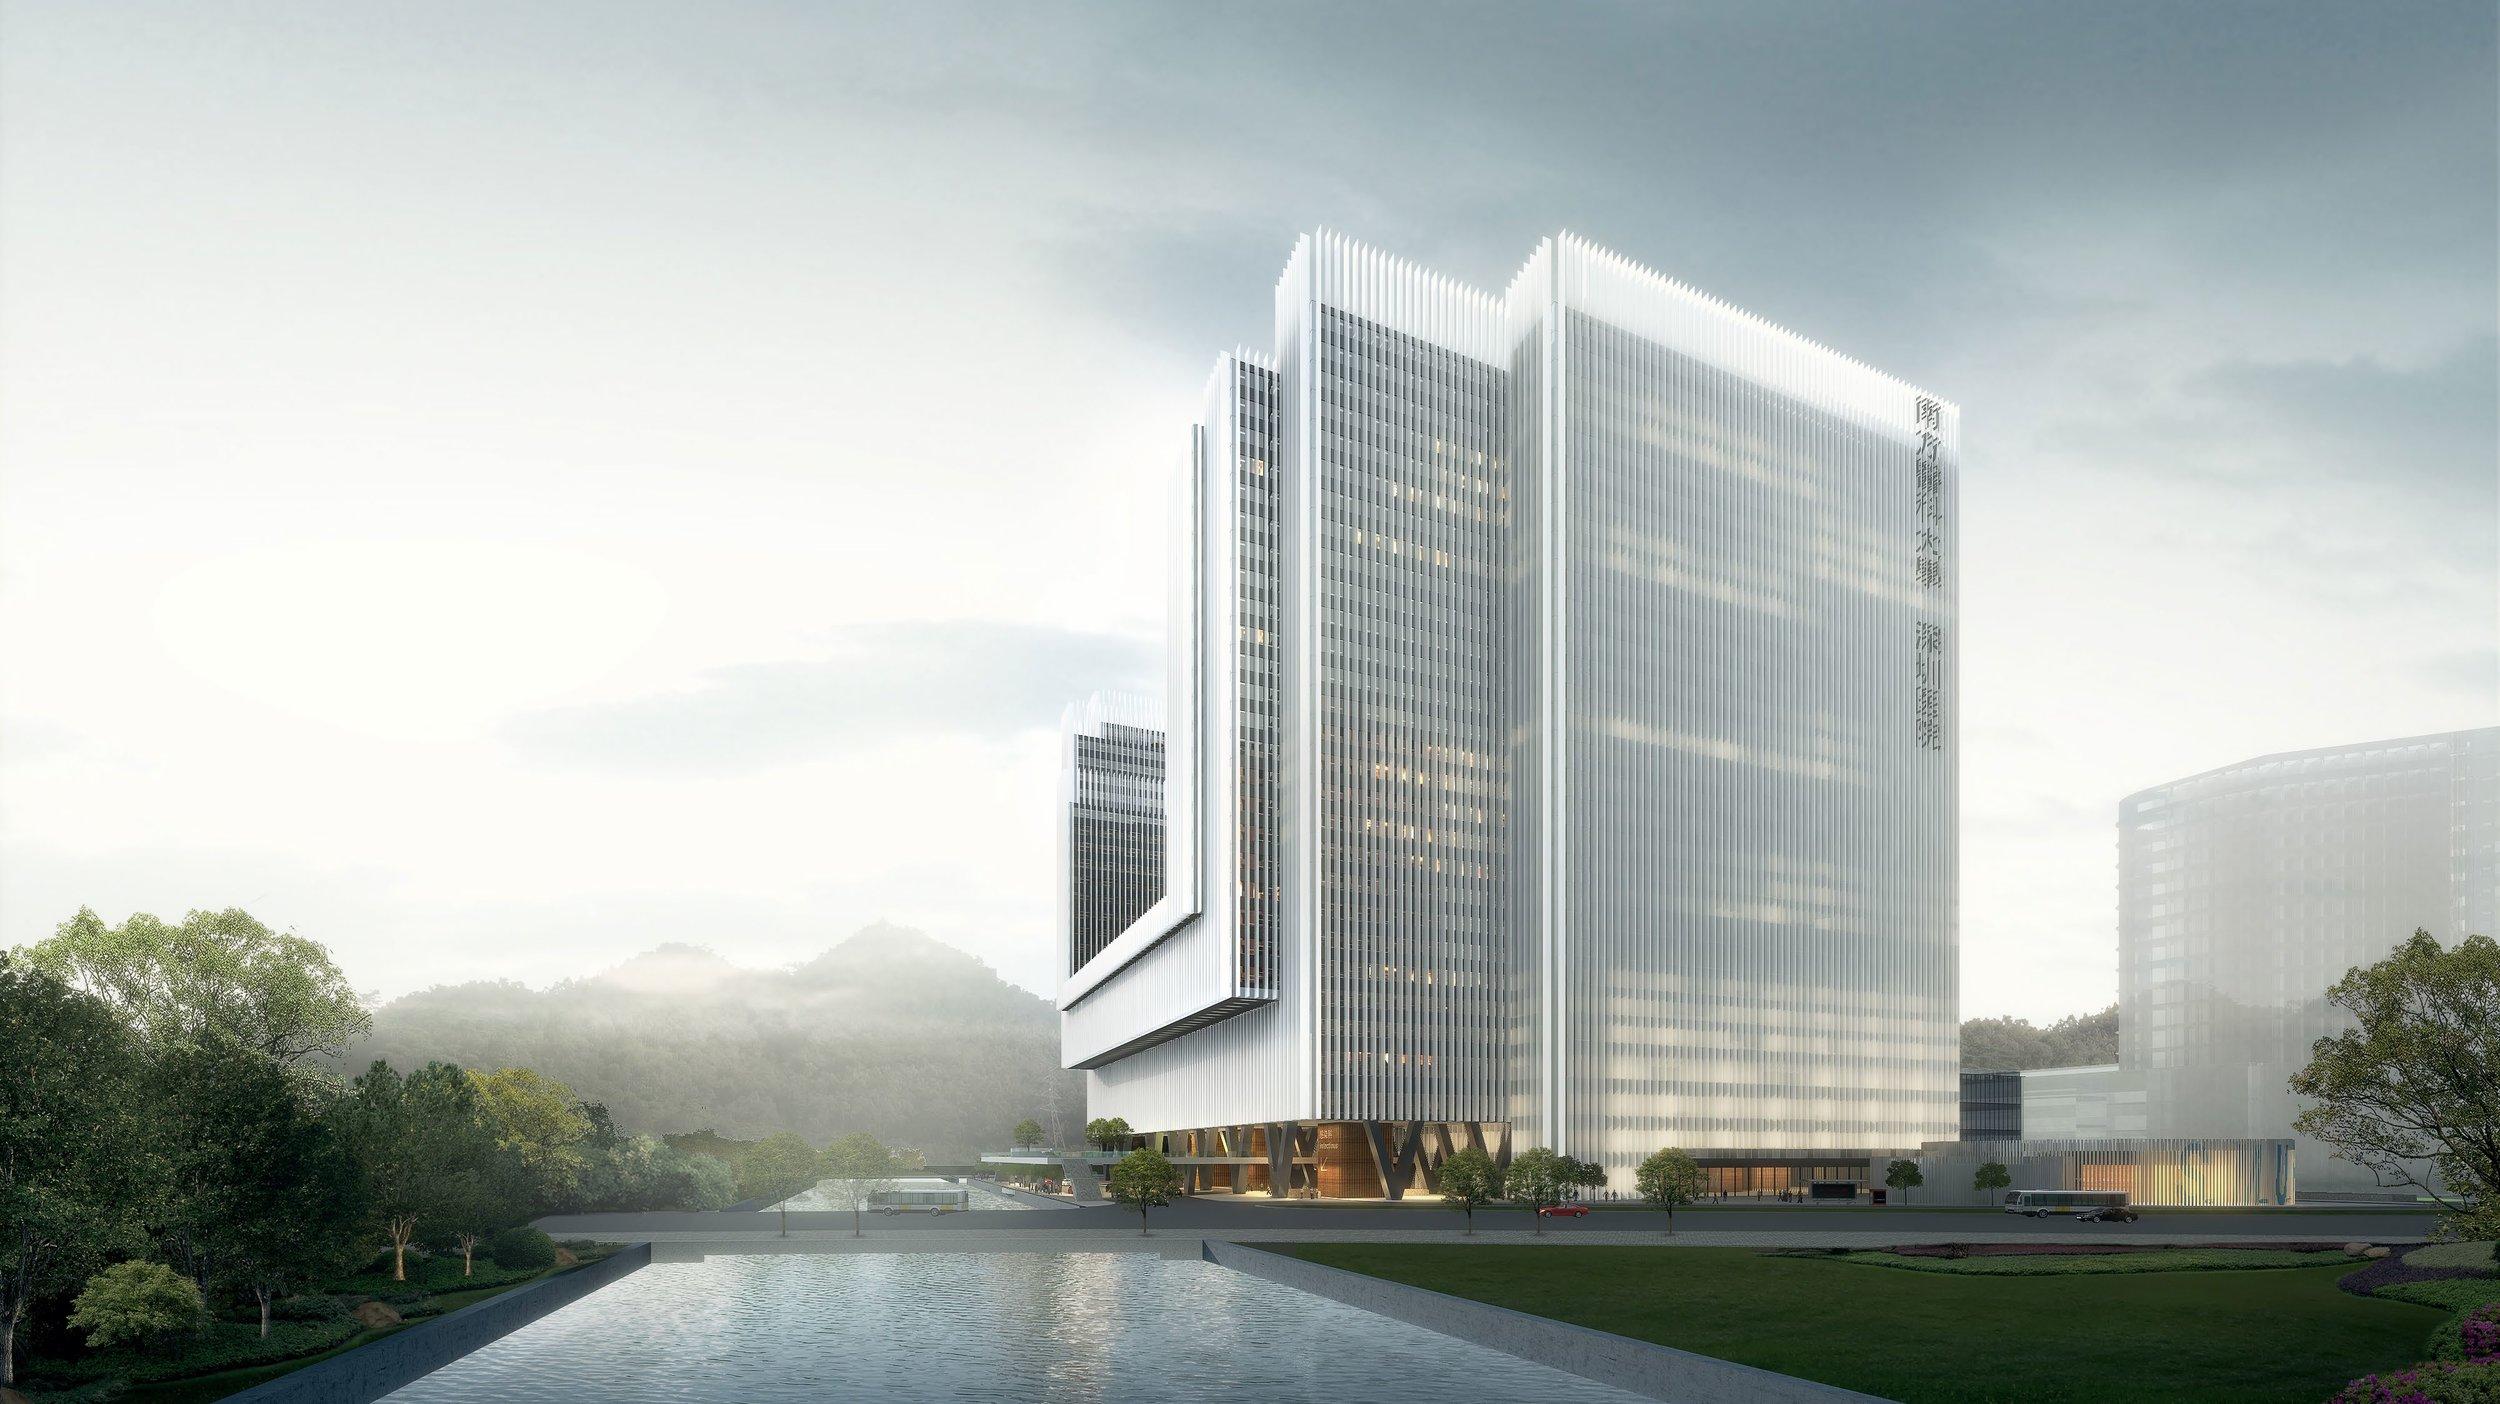 The Second phase of the Shenzhen Hospital of Southern Medical University  shenzhen, china